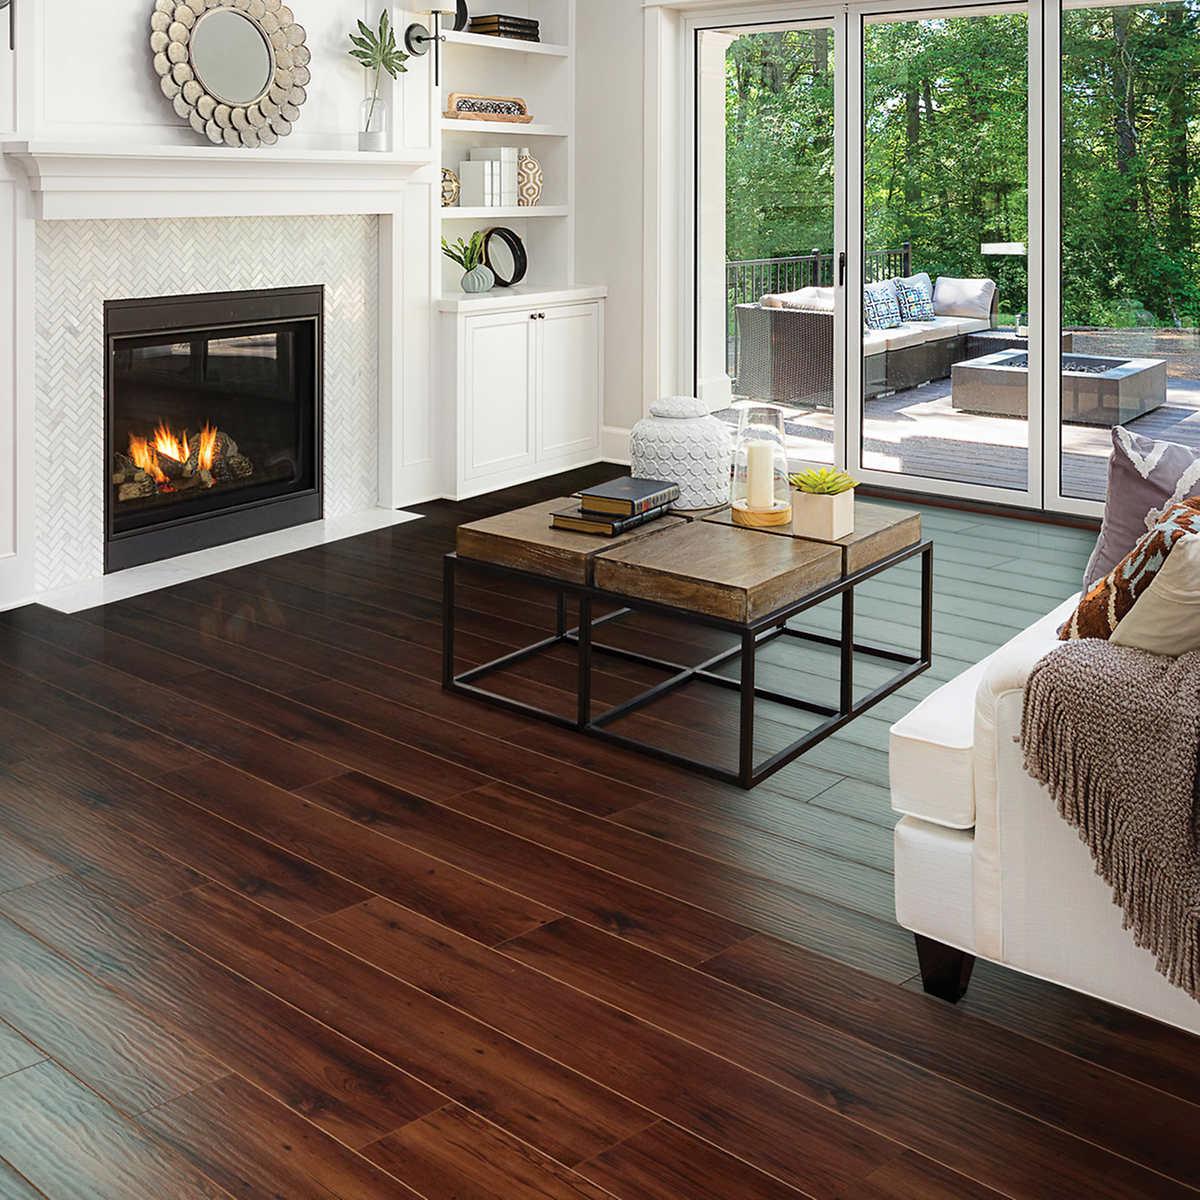 select golden imageservice cm floor registered similar embossed laminate profileid products recipeid flooring costco silverwood product in id